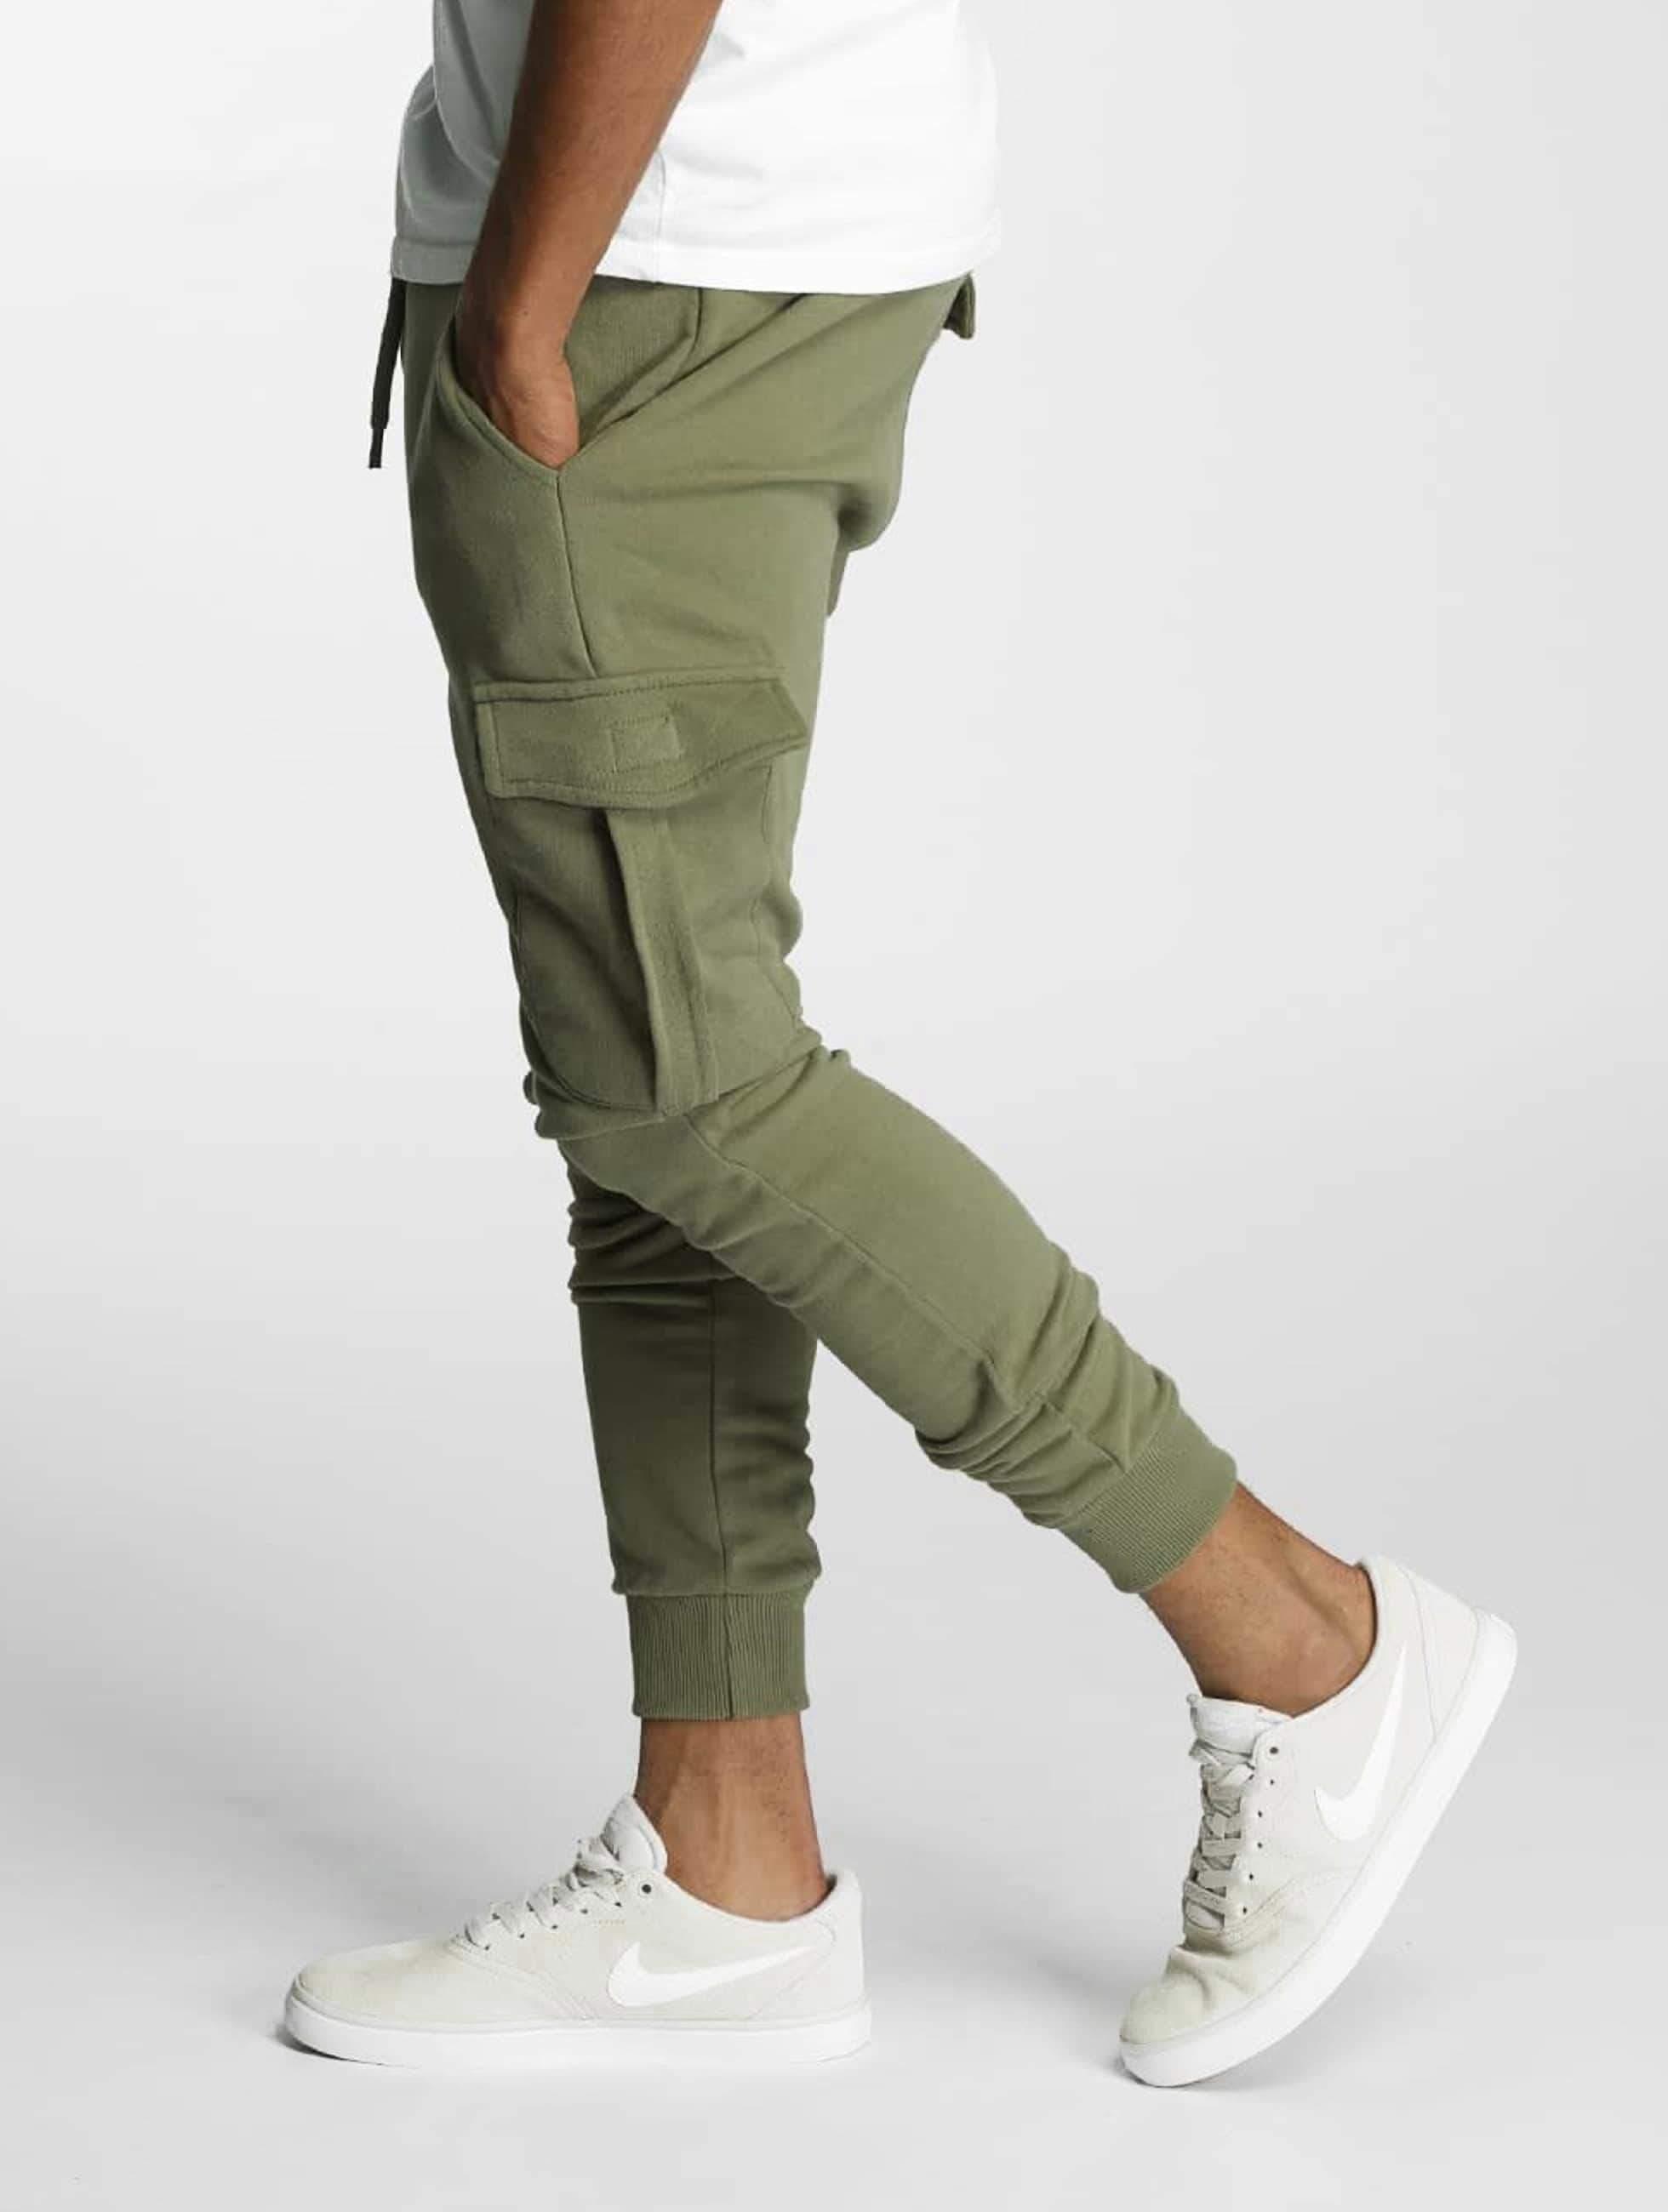 gut neue auswahl detaillierter Blick DEF Gringo Sweatpants Olive